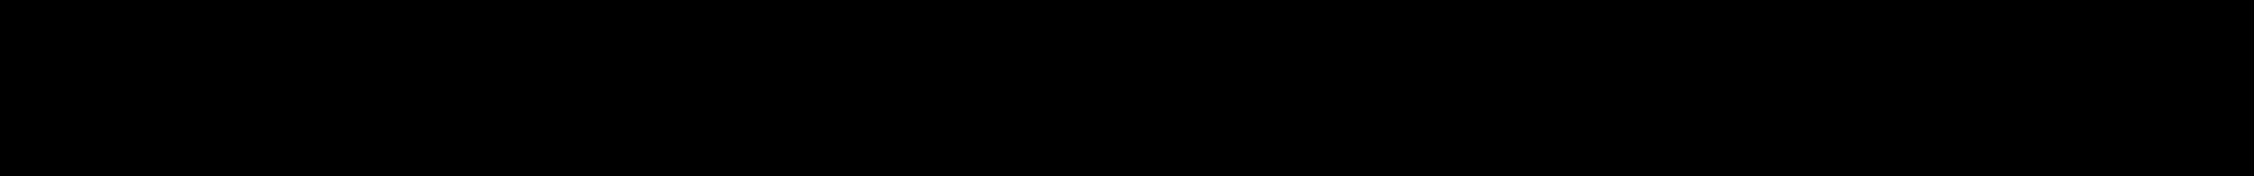 2254x176 Clipart